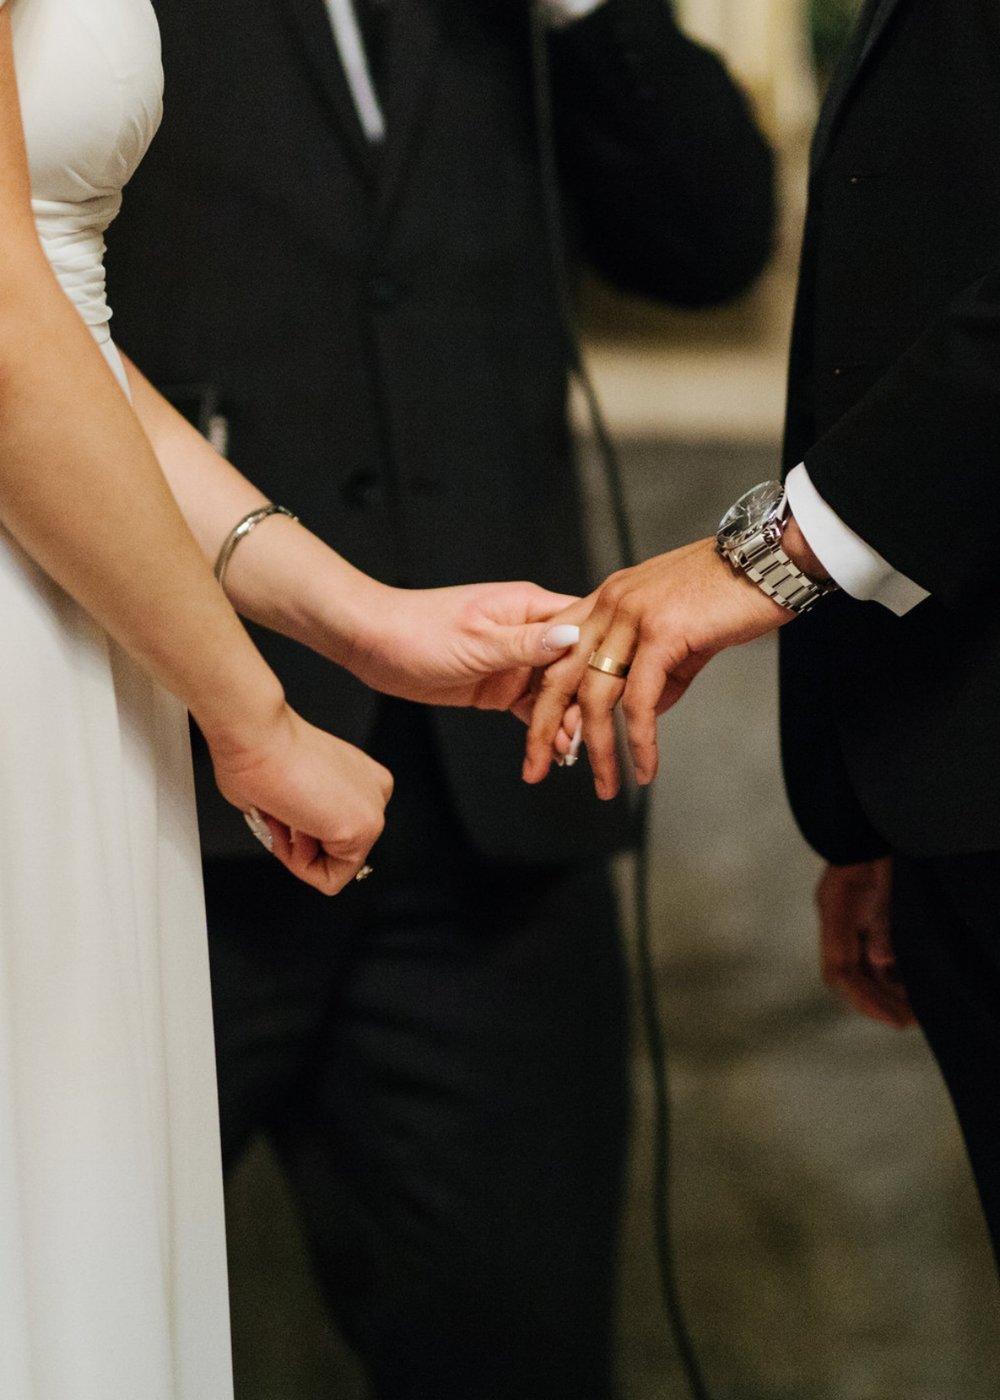 herastudios_wedding1_danica_sanjeev_hera_selects-36.jpg